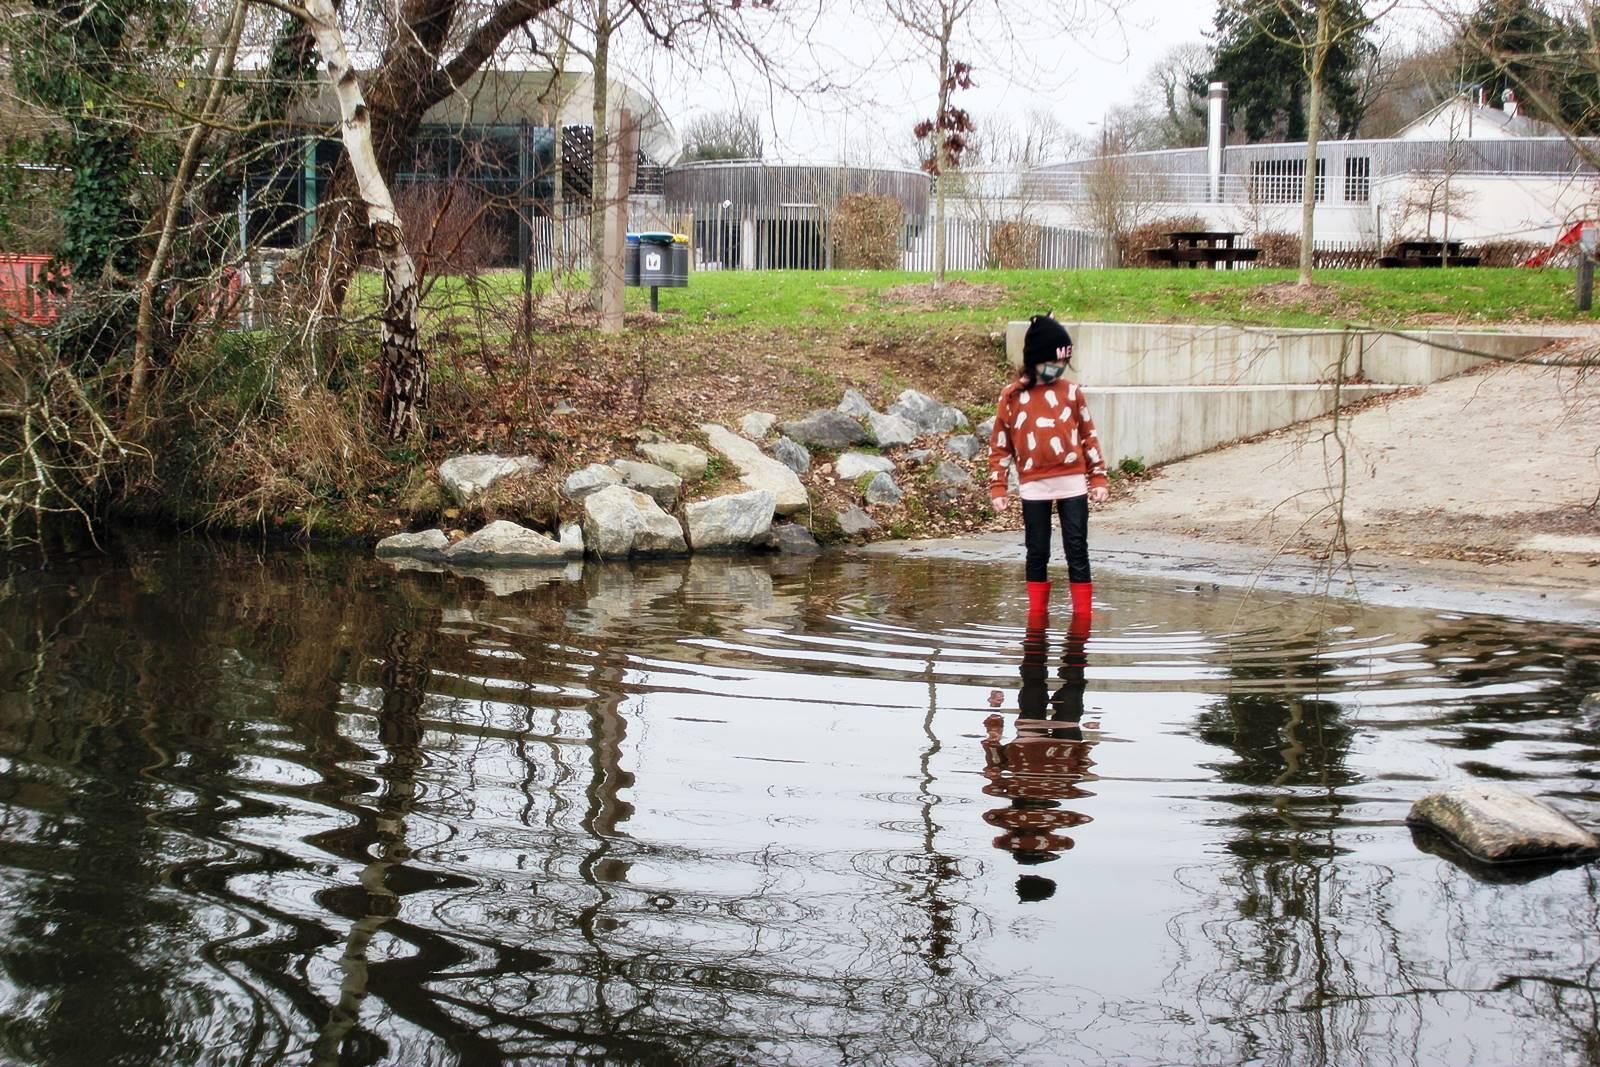 Blog lac de savenay randonneeimg 7824